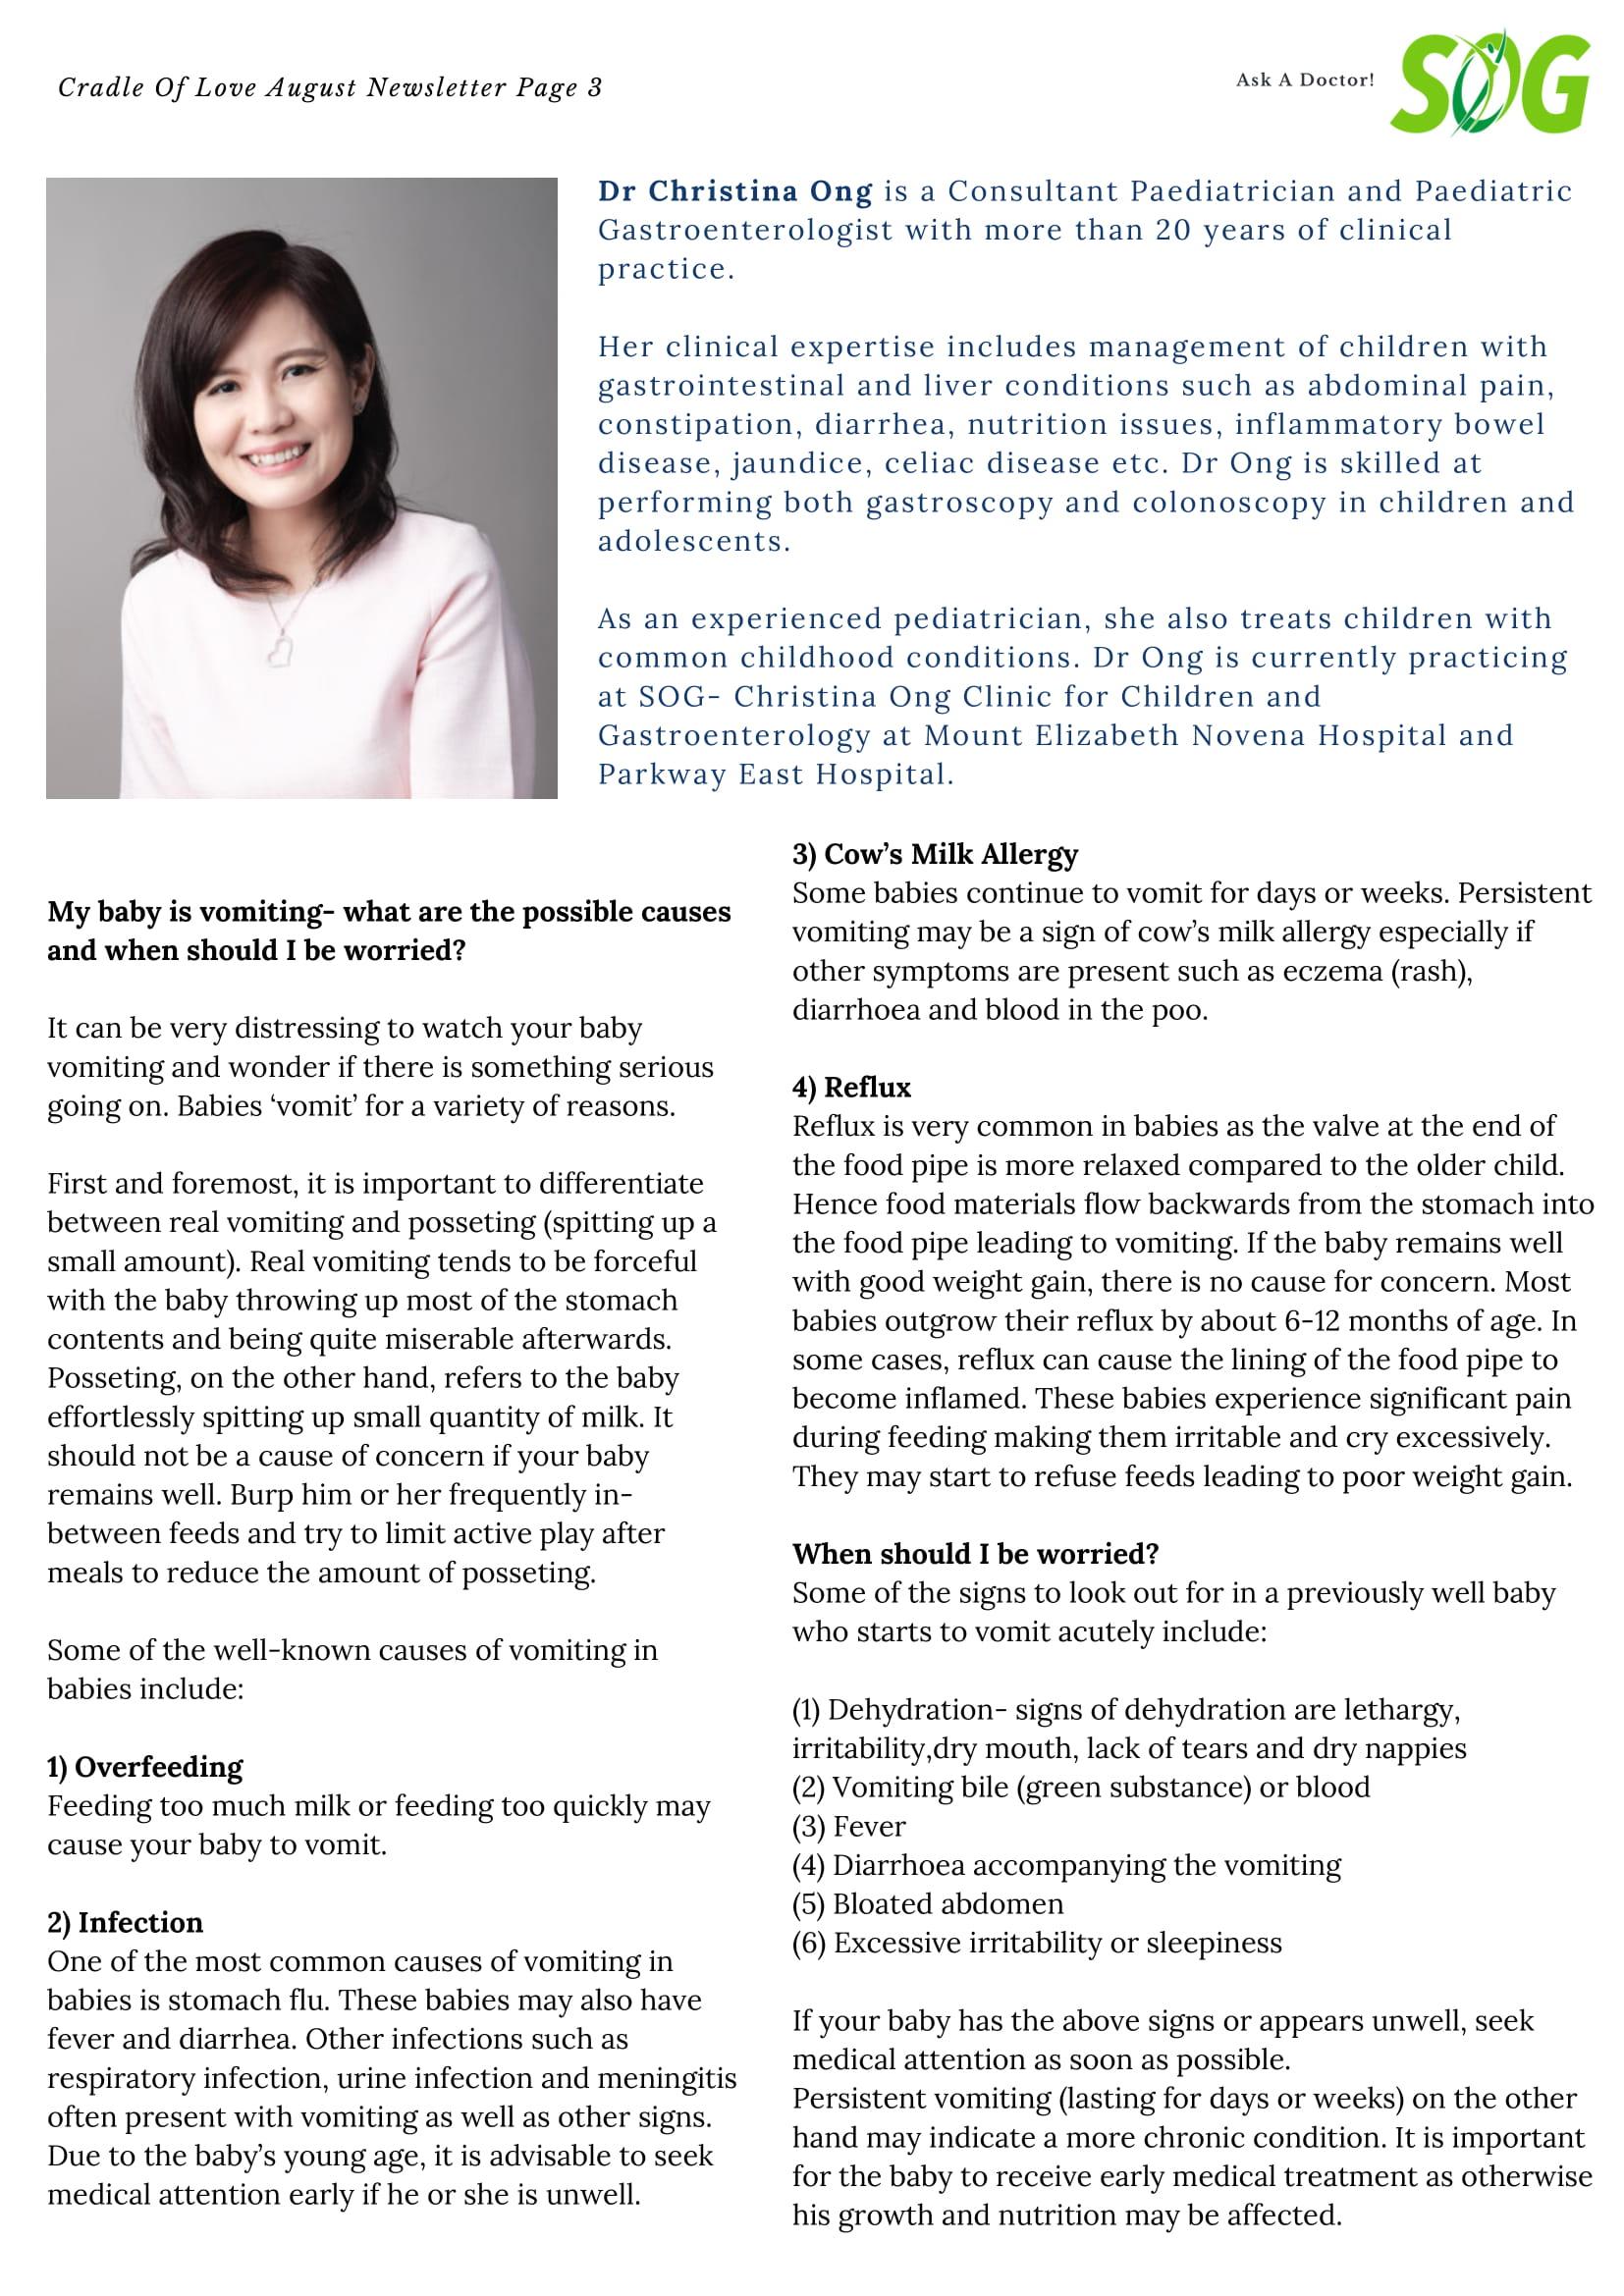 Dr Christina Ong Paediatrician & Gastroenterologist